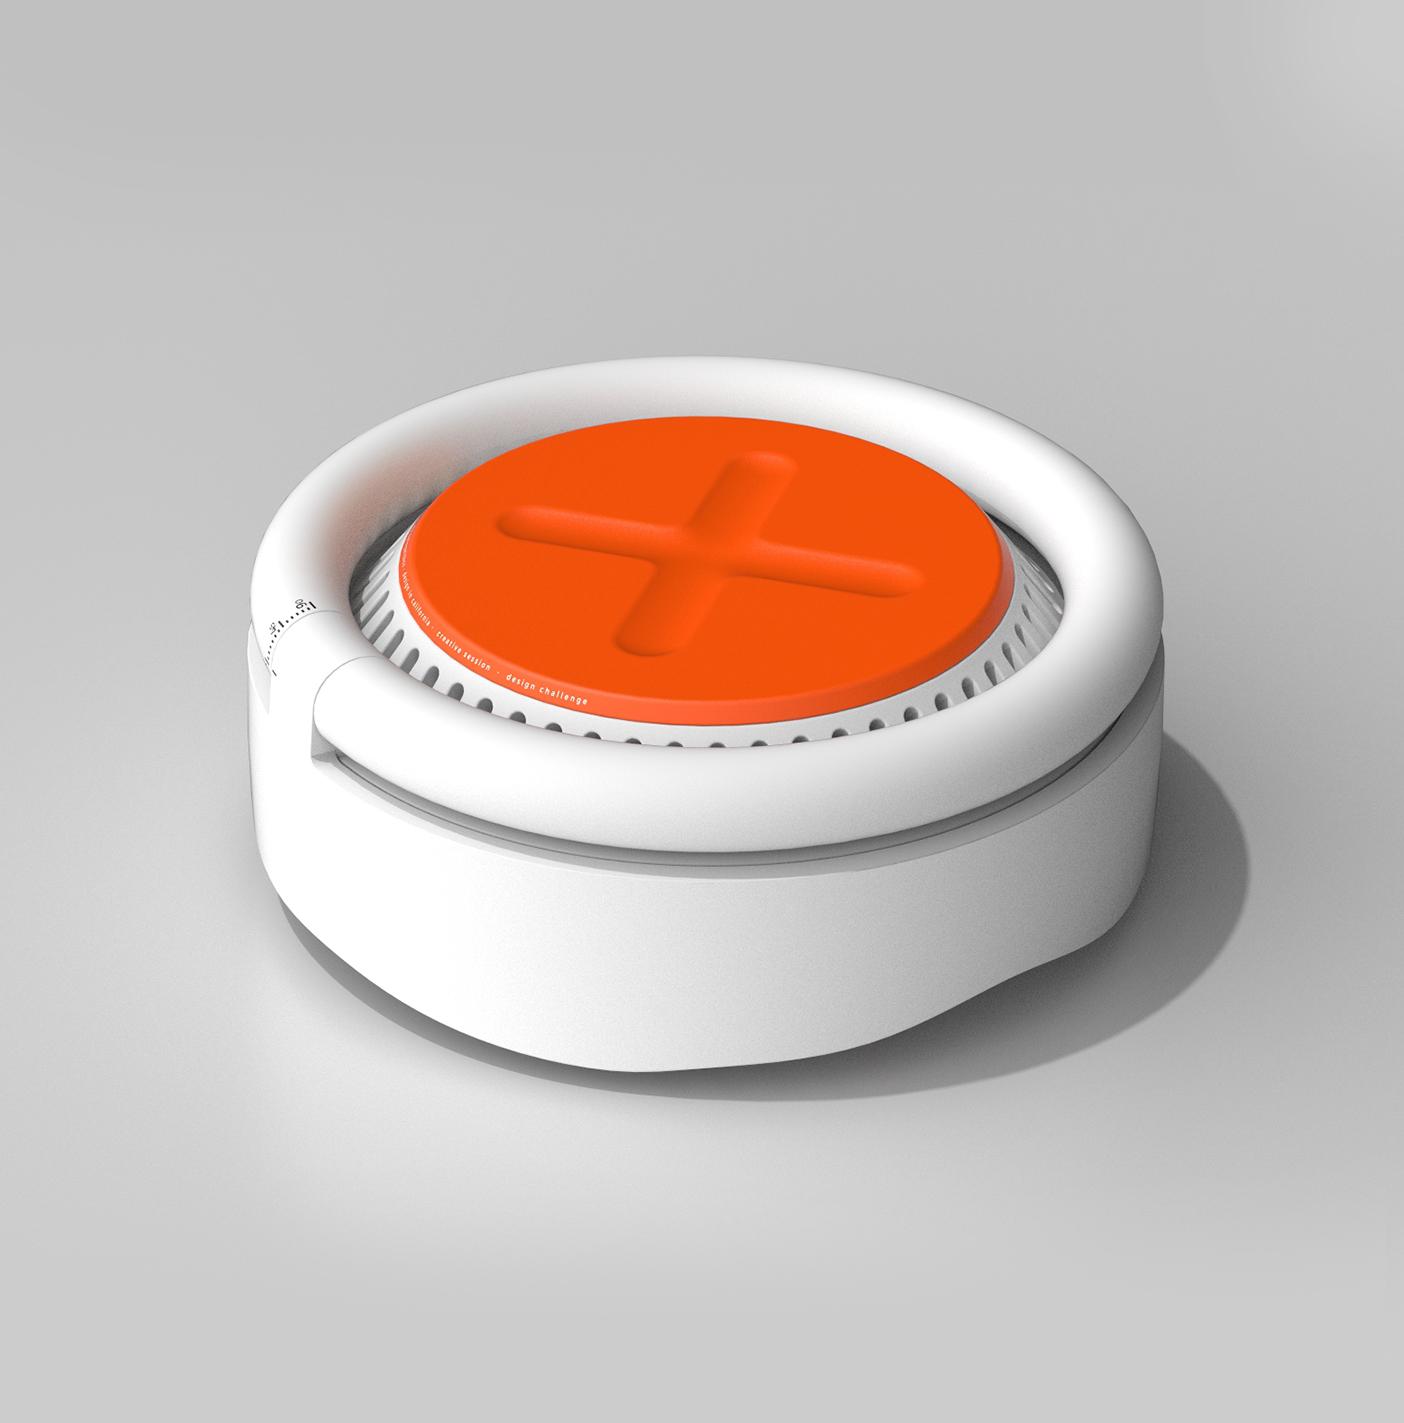 _blowing-with-cs-deskfan-hoang-industrialdesign_1C.jpg